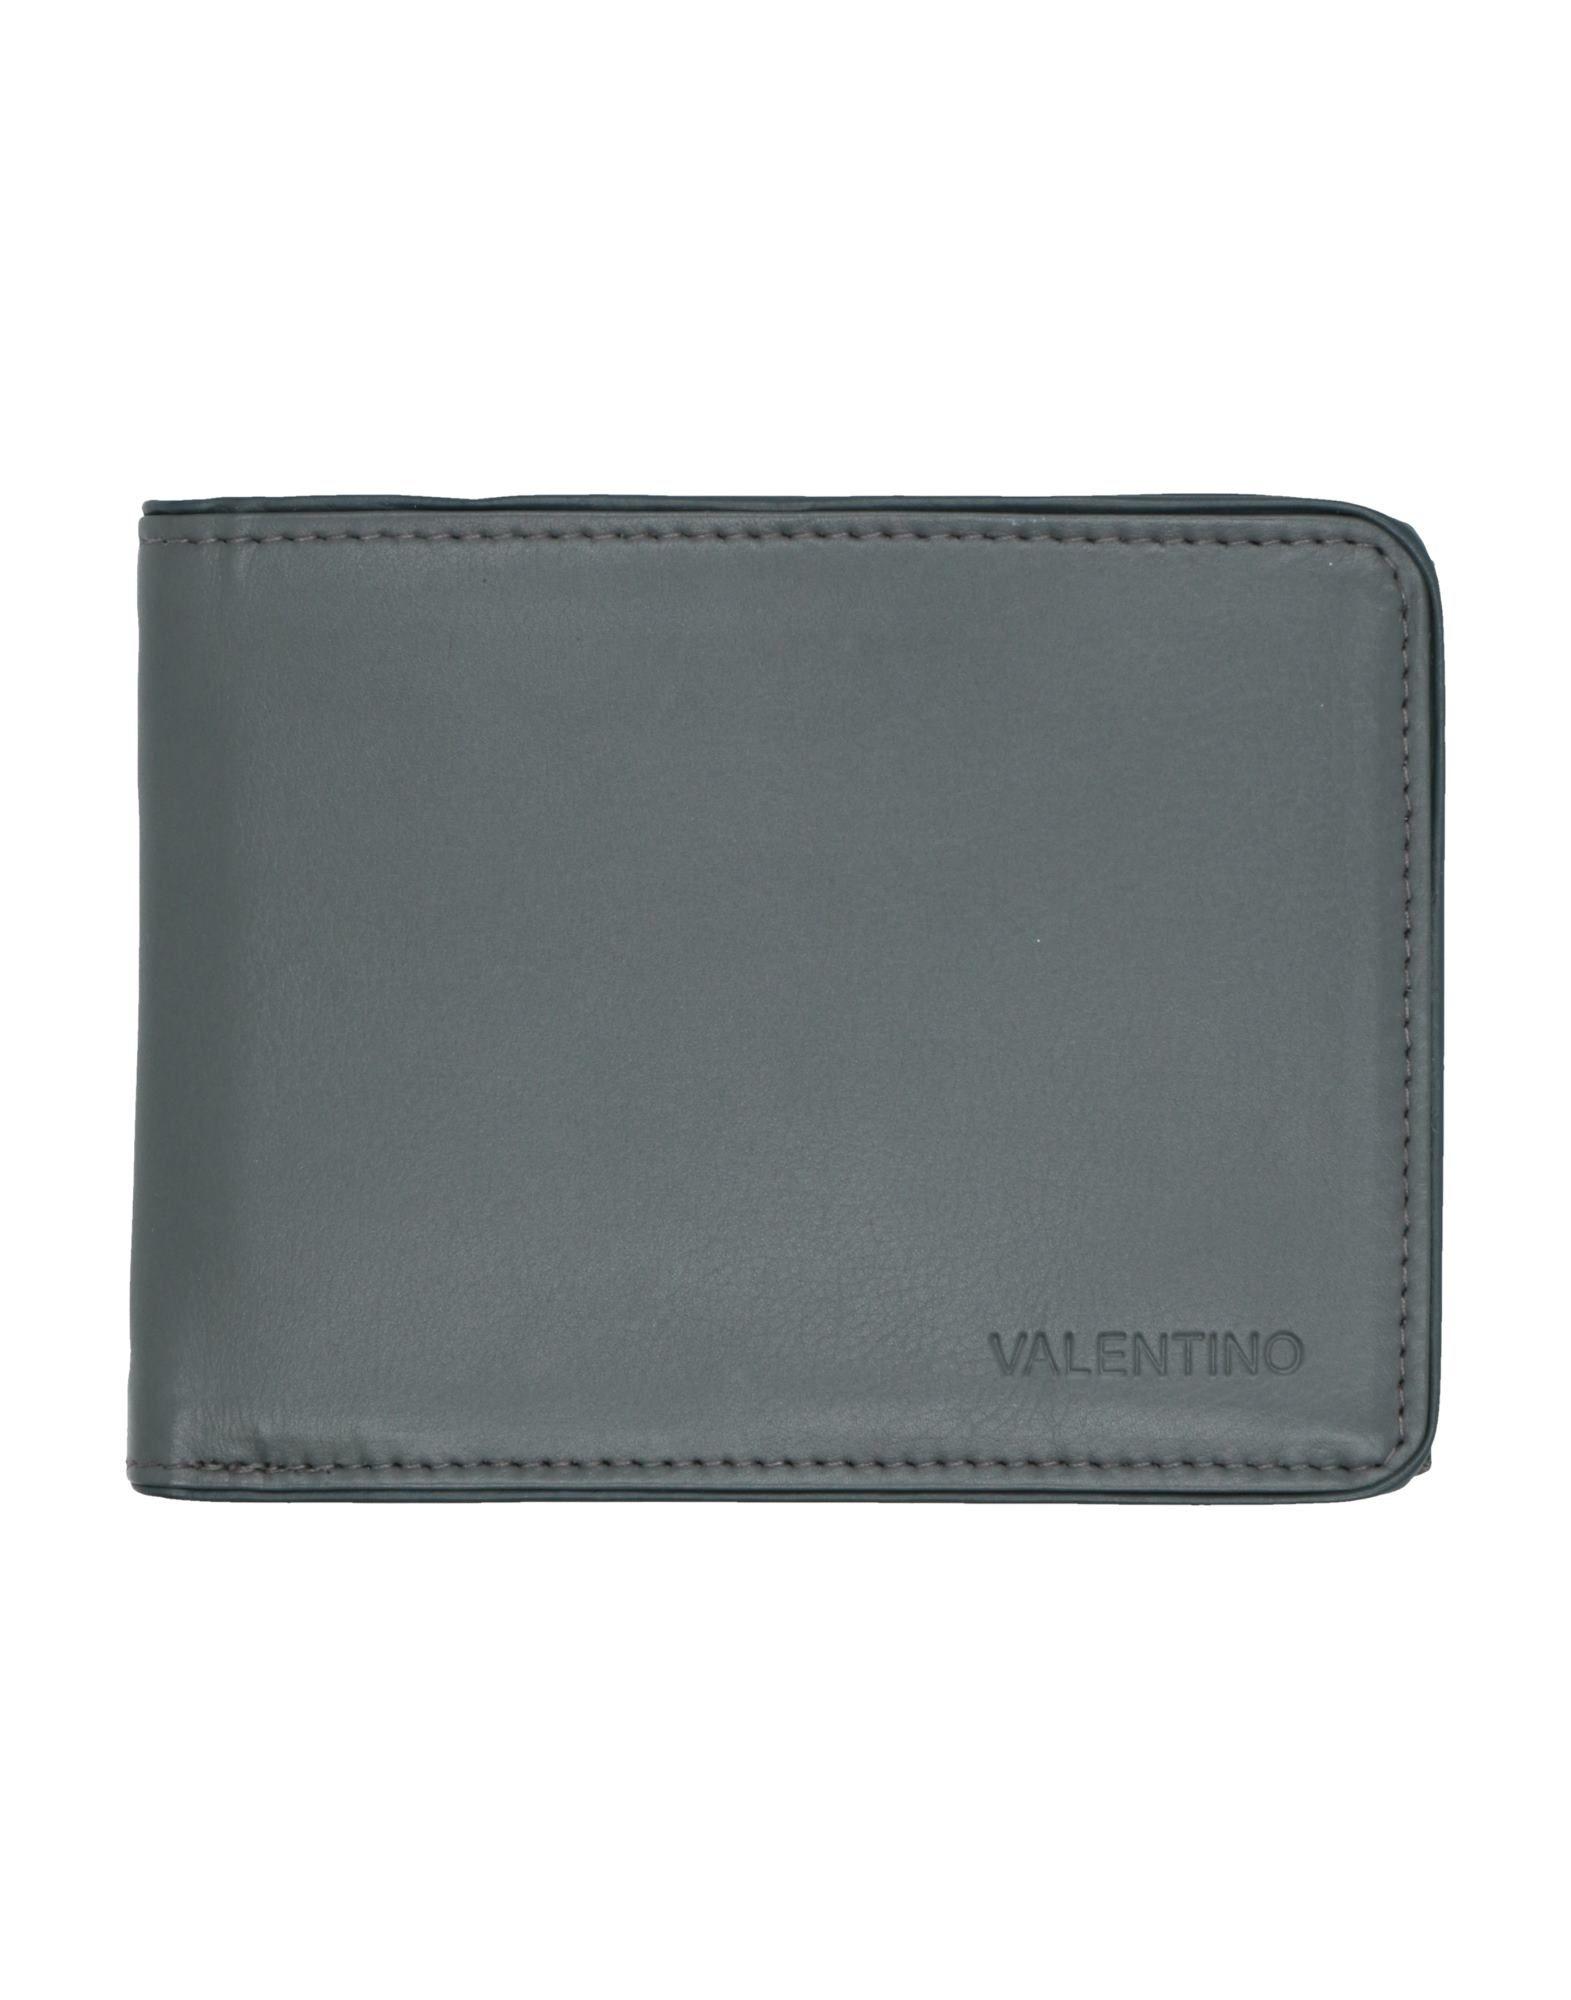 1d5ba52d04d7 ヴァレンティノ(VALENTINO) メンズ長財布   通販・人気ランキング - 価格.com